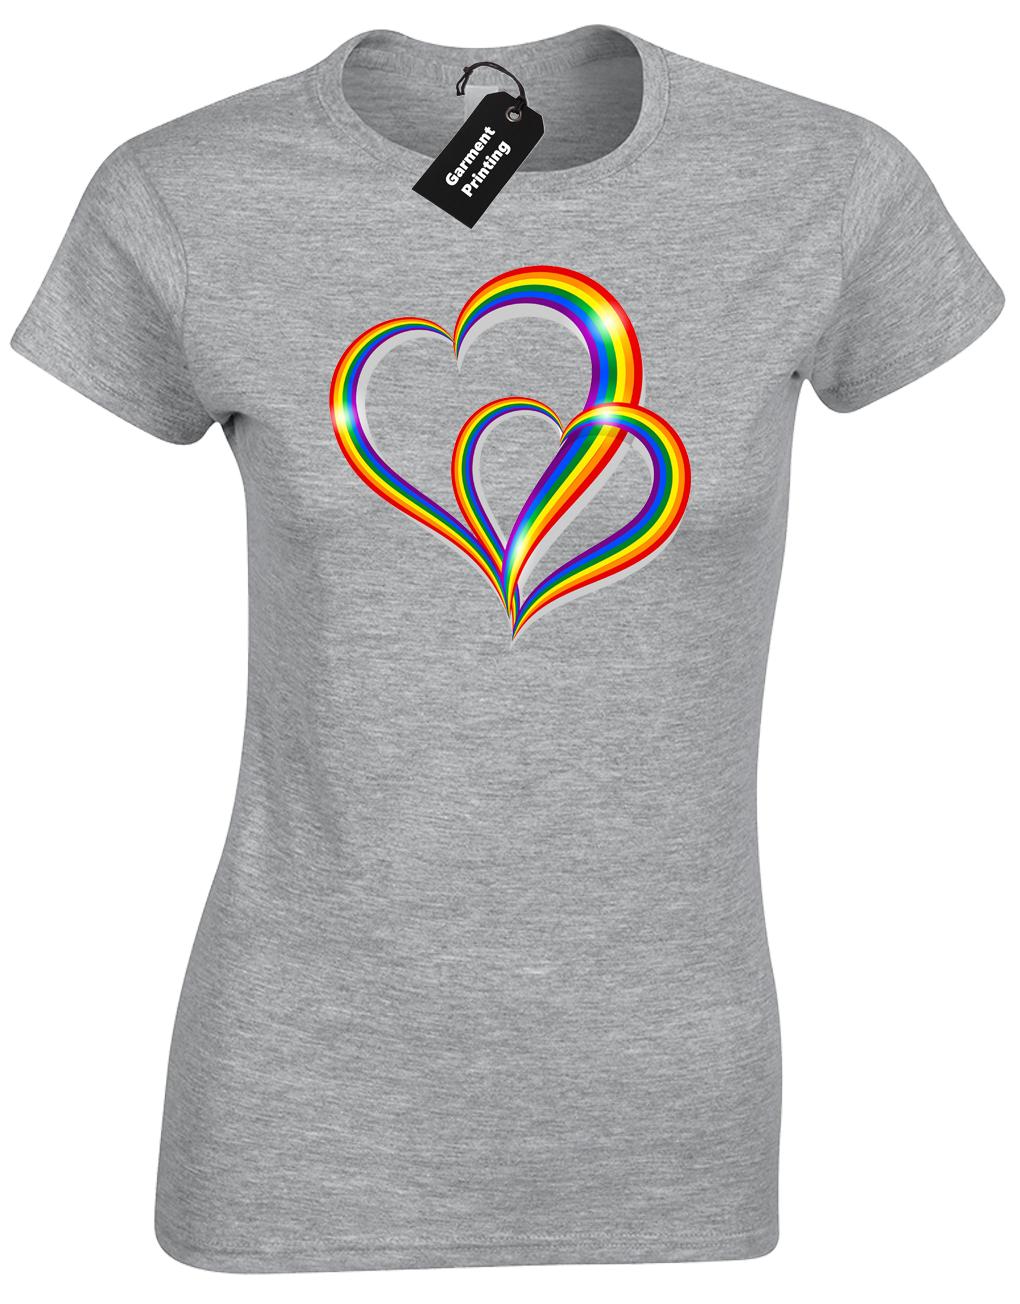 2 Pride Hearts Ladies T-Shirt Gay Lesbian Lgbt Unisex Rainbow Womens Top ( Col) 5